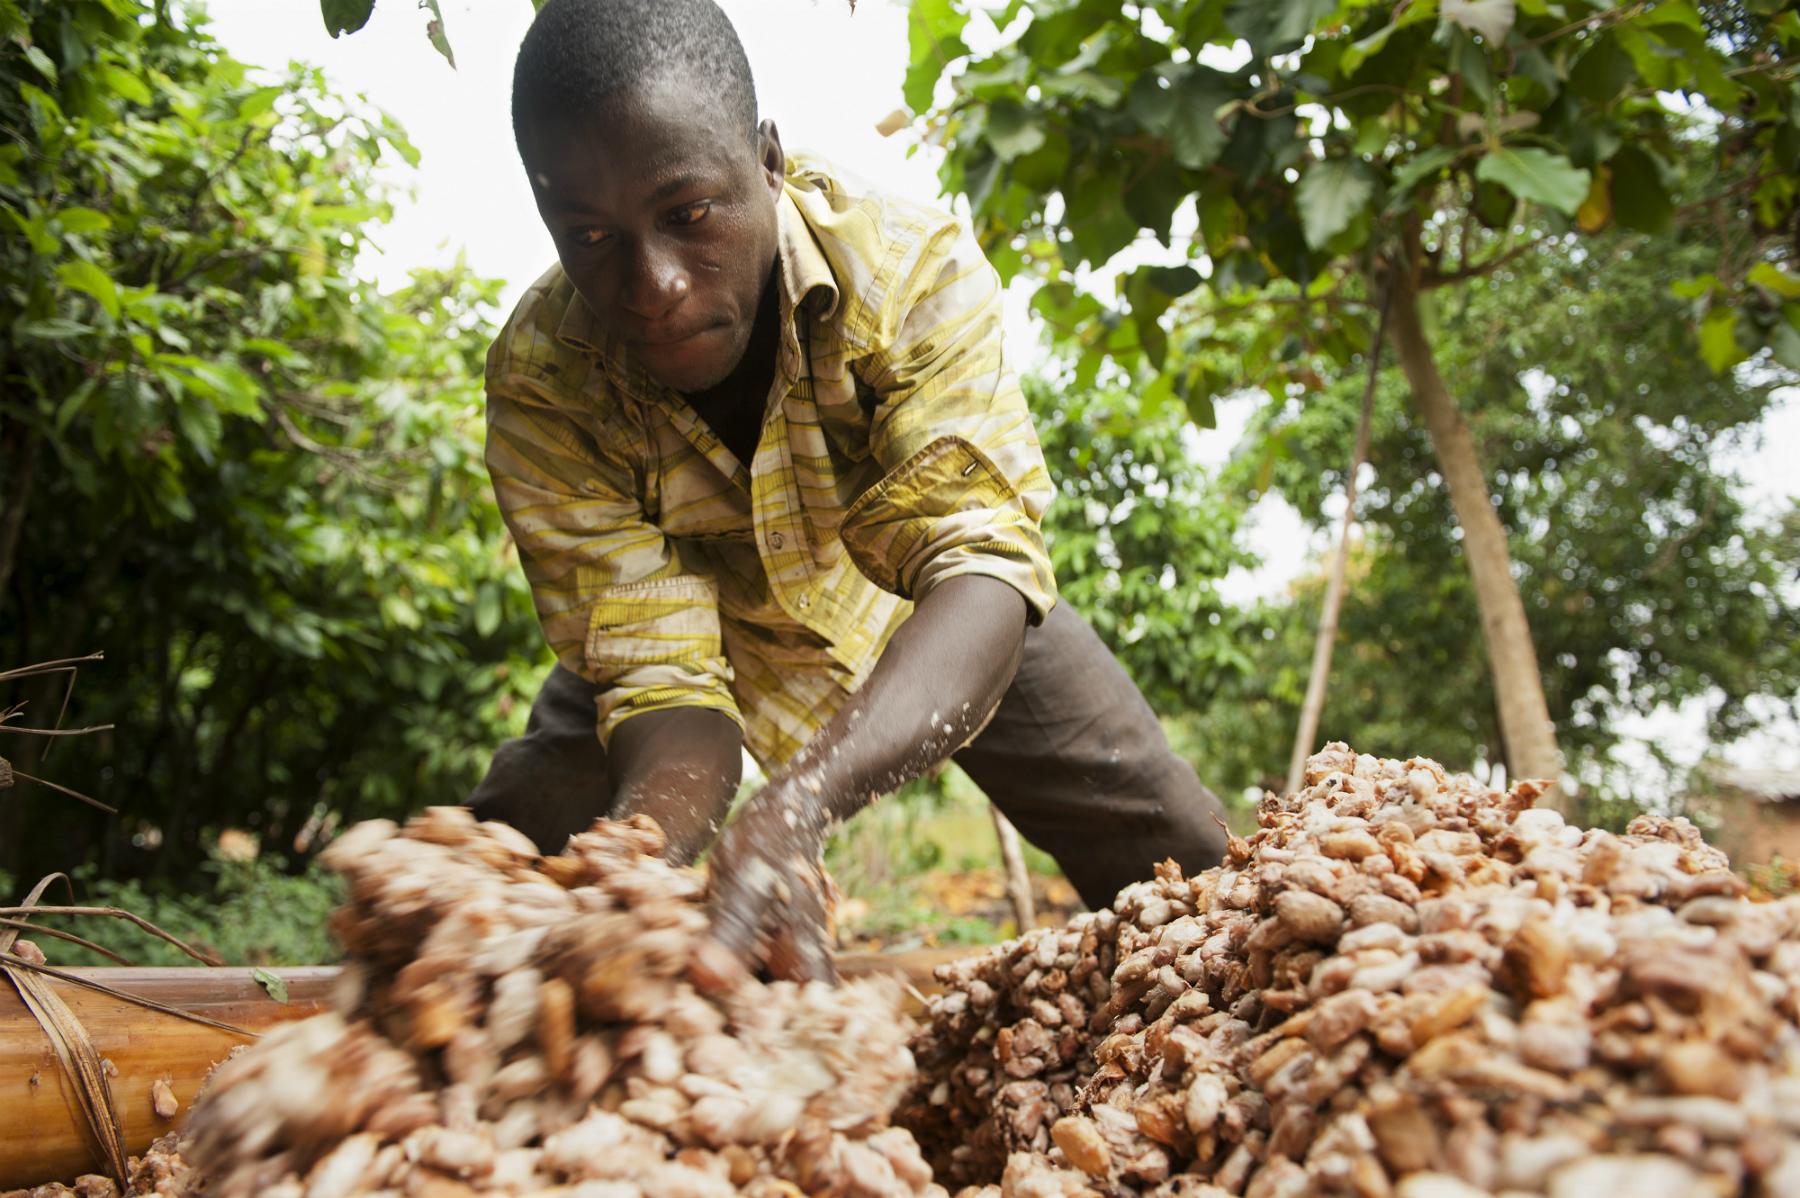 Guilt-free chocolate: Supermarket giant Aldi embraces fair trade cocoa